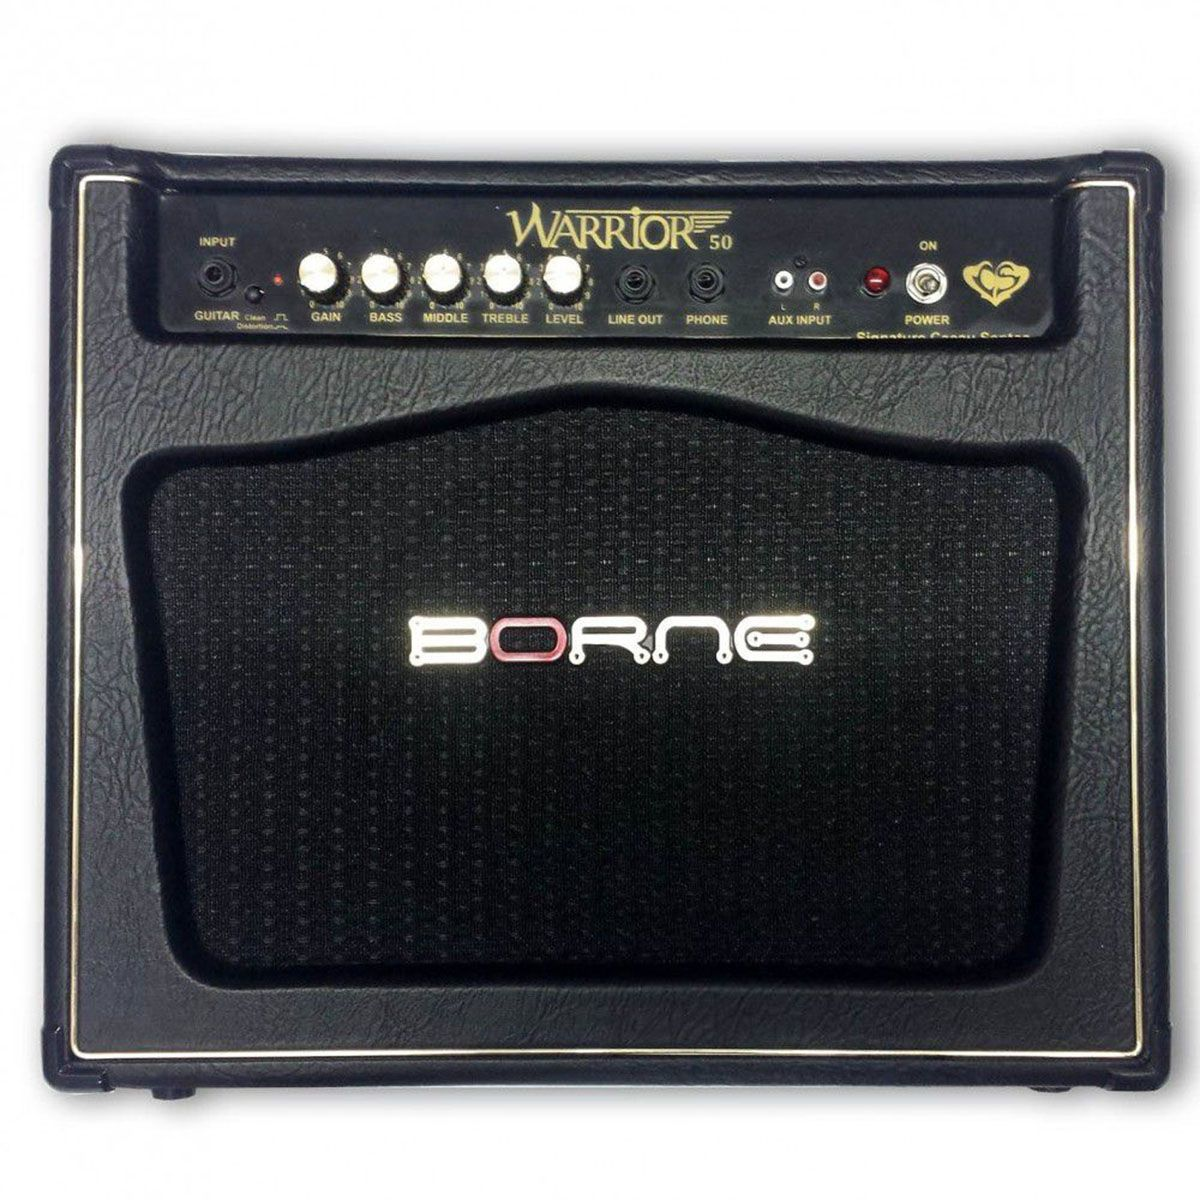 Caixa Amplificada Borne Warrior 50 1x10 50w RMS Black